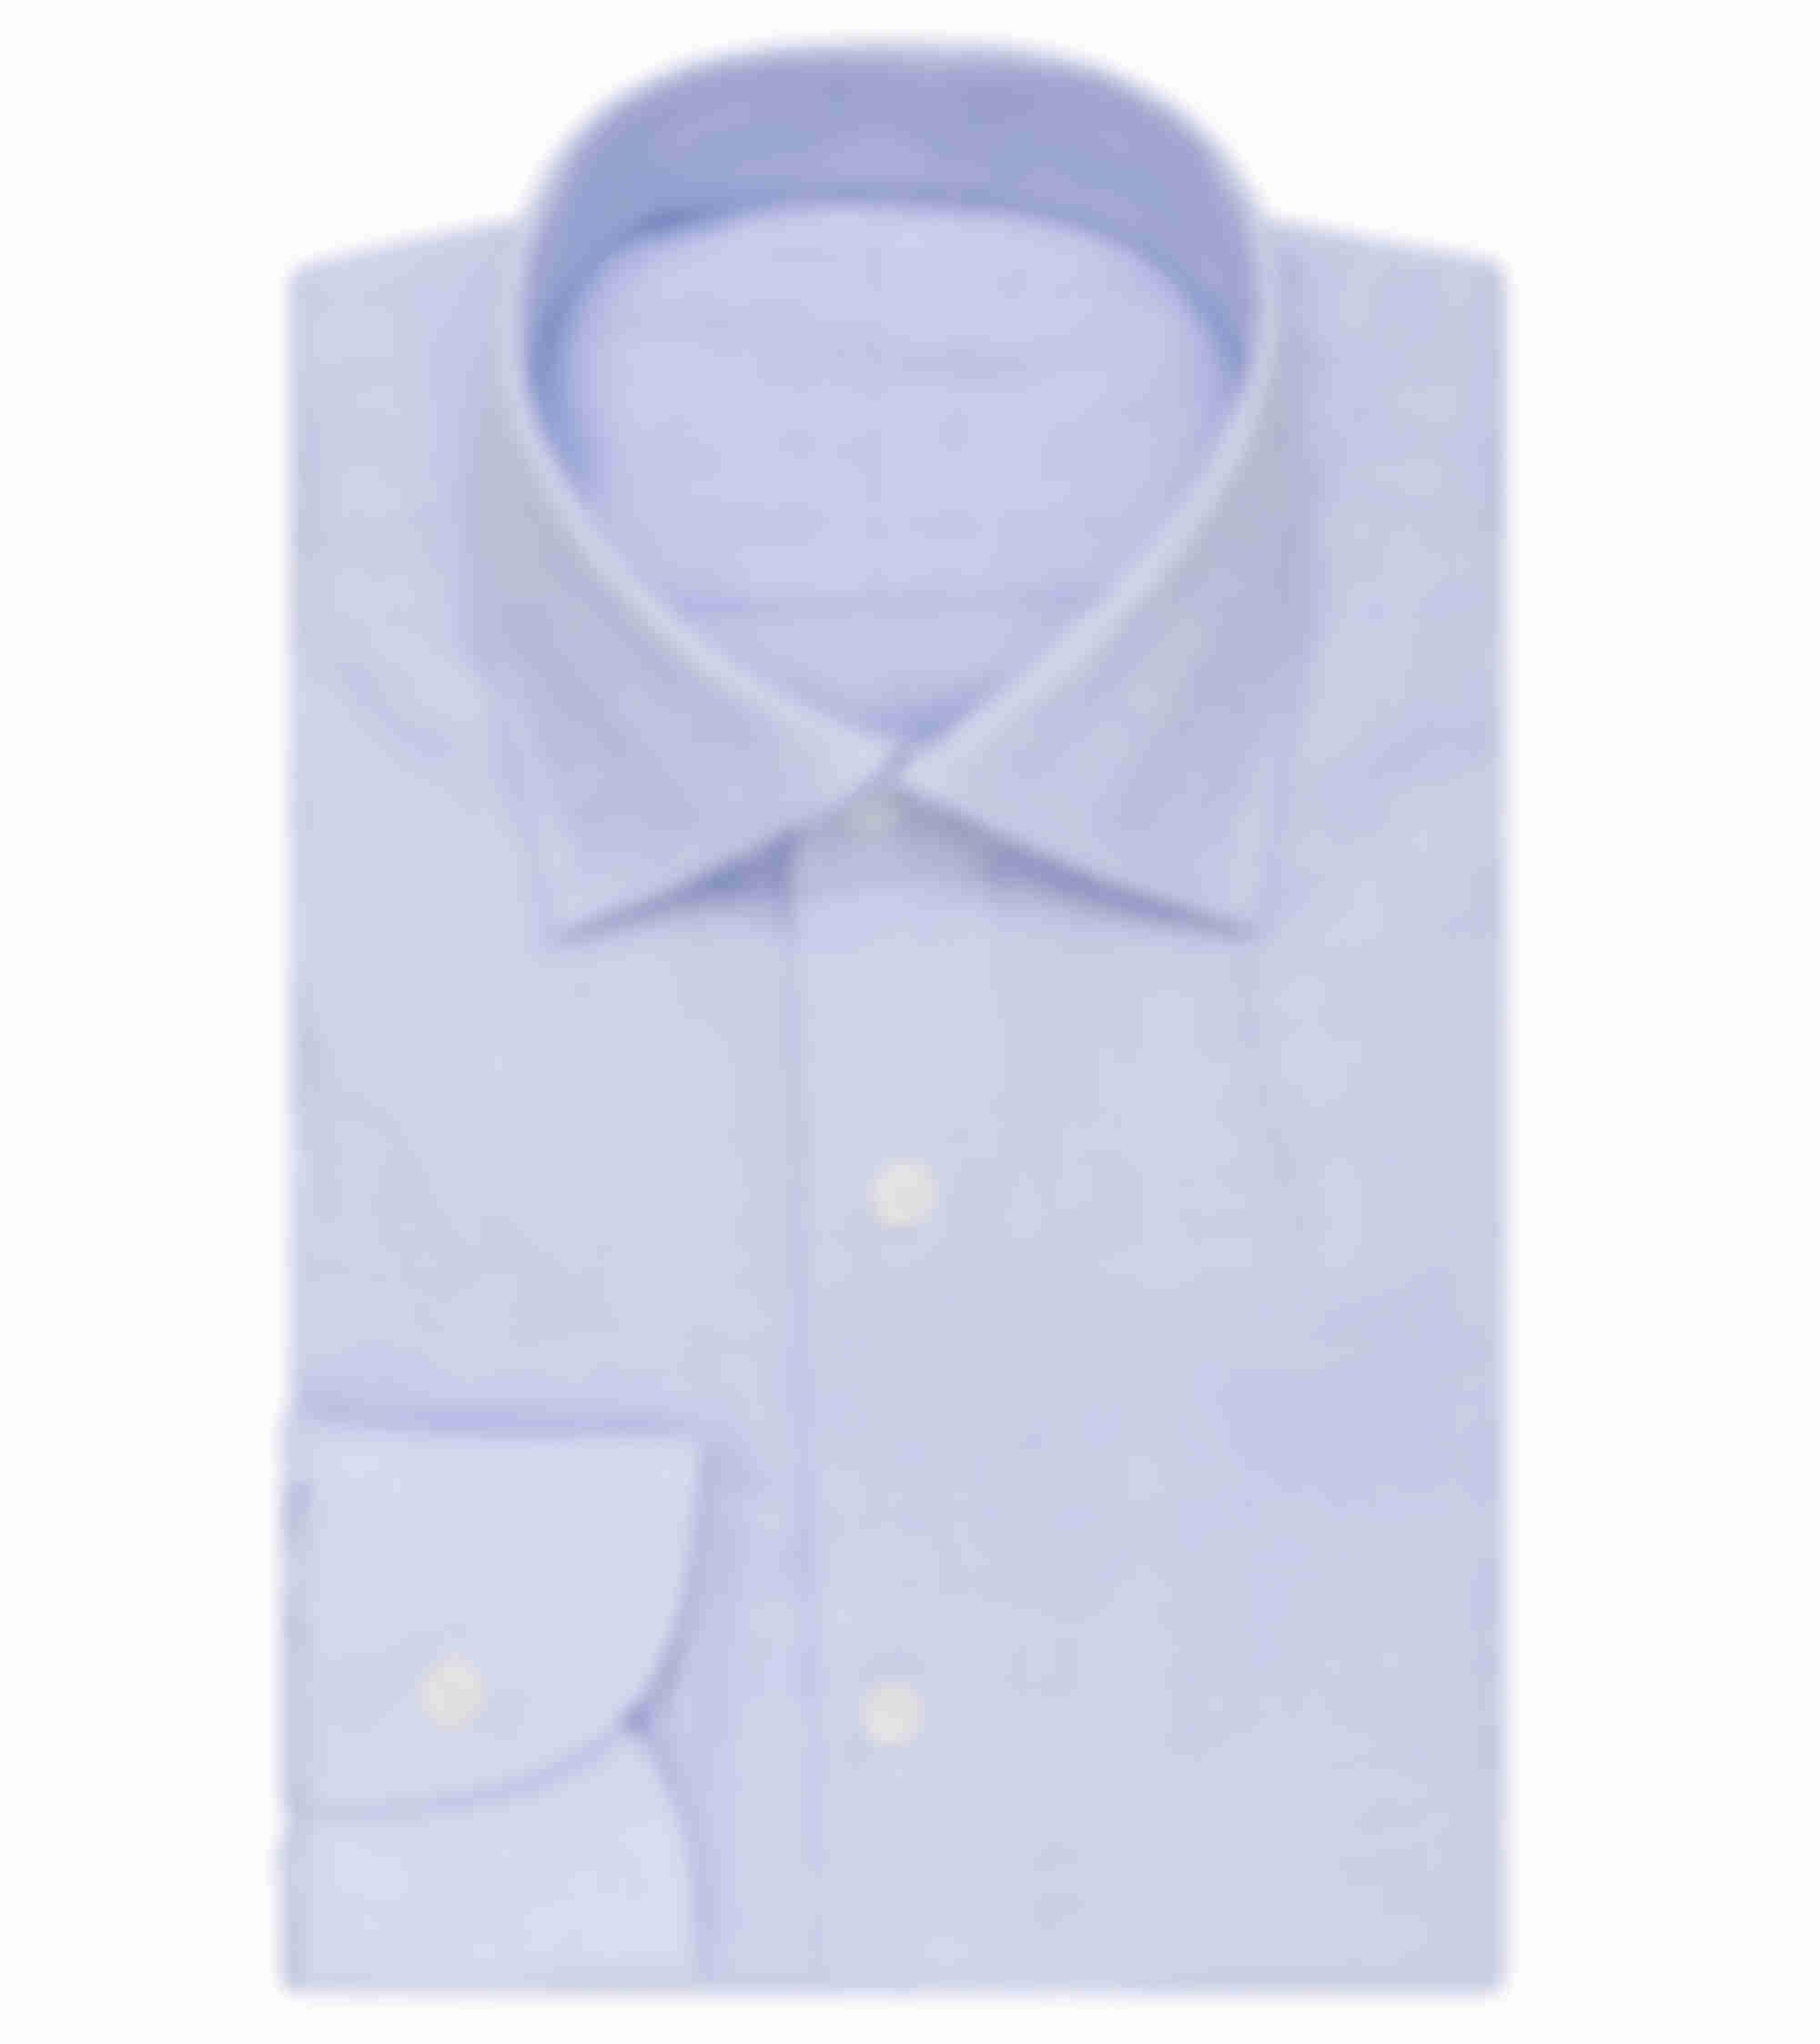 Chemise sur mesure en tissu Thomas Mason pinpoint bleu Atelier Mesure